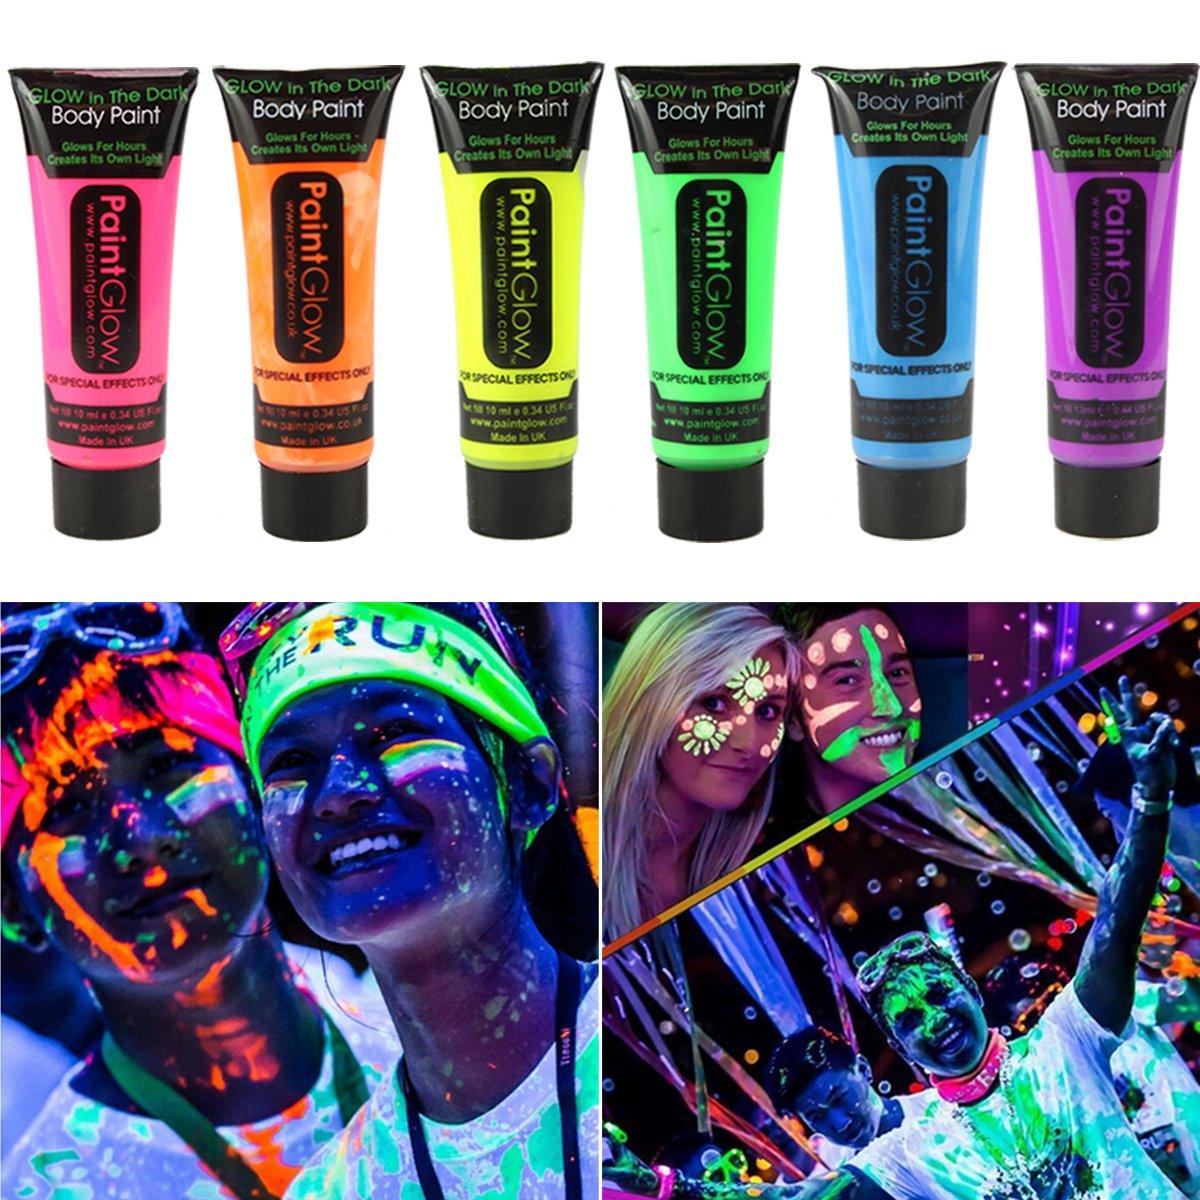 GARYOB Glow in Dark Face Body Paint UV Blacklight Neon Fluorescent-0.35oz Set of 6 Tubes